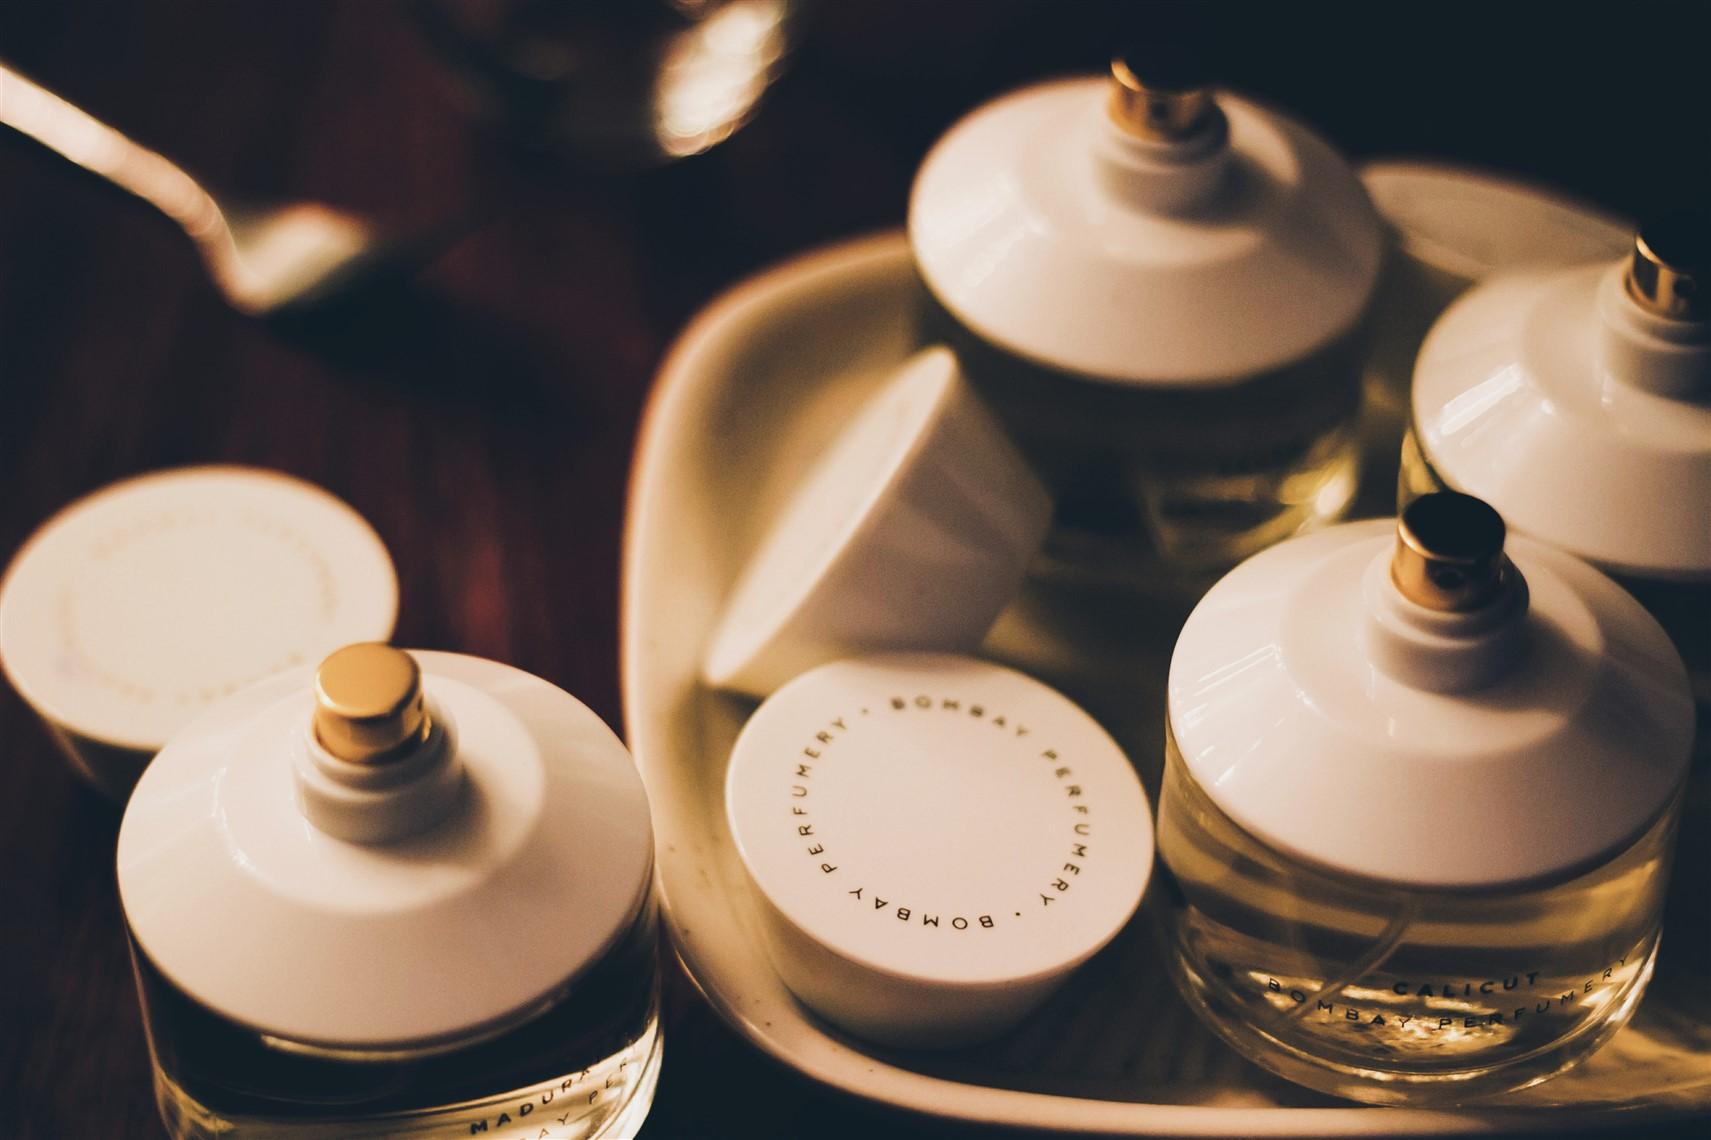 bombay perfumery feature on the jeromy diaries